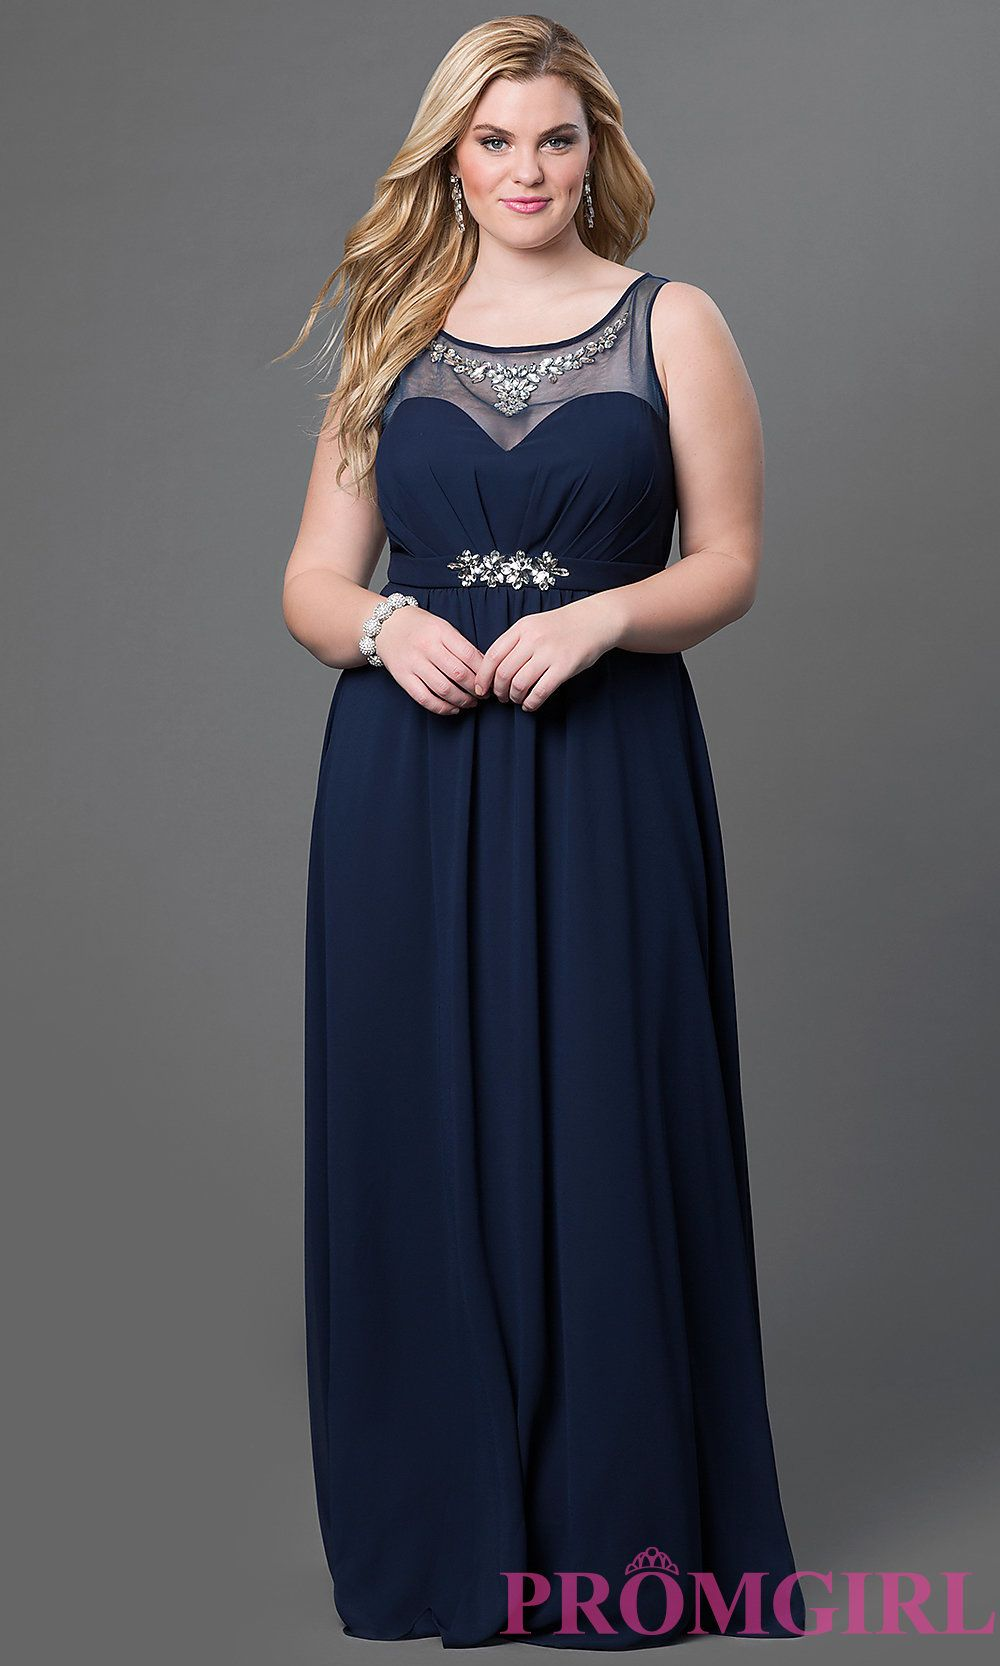 Formal Dresses Sydney Parramatta Gallery Design Ideas Road Choice Image